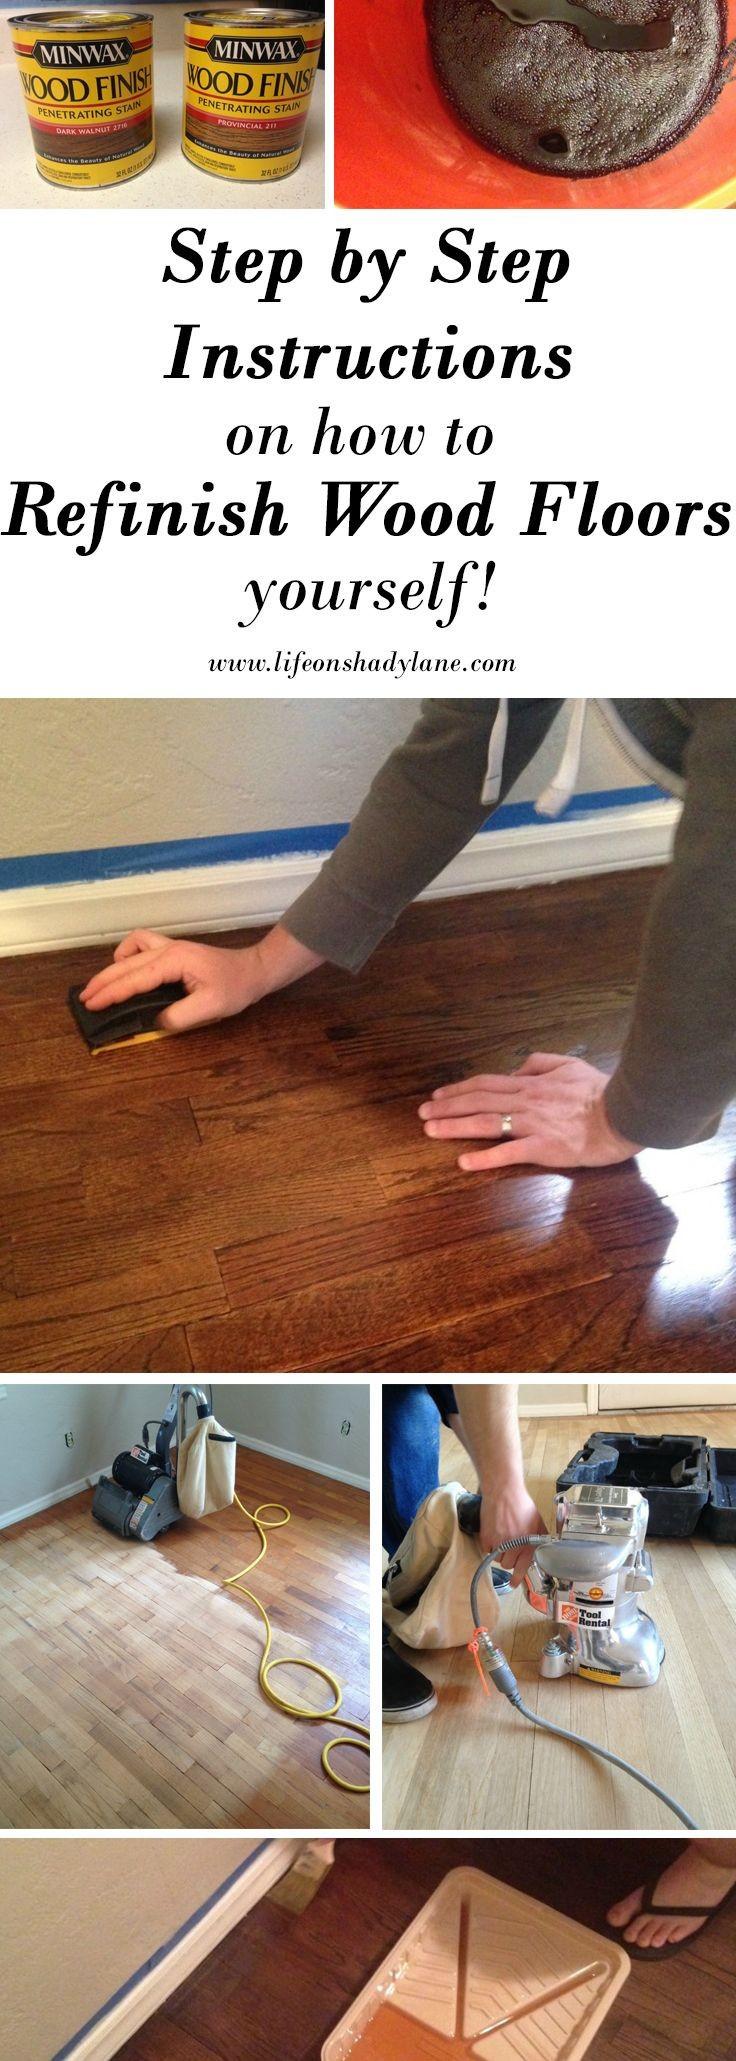 where to rent hardwood floor nailer of 13 fresh hardwood floor repair kit pics dizpos com pertaining to hardwood floor repair kit fresh how to refinish hardwood floors part 1 pics of 13 fresh